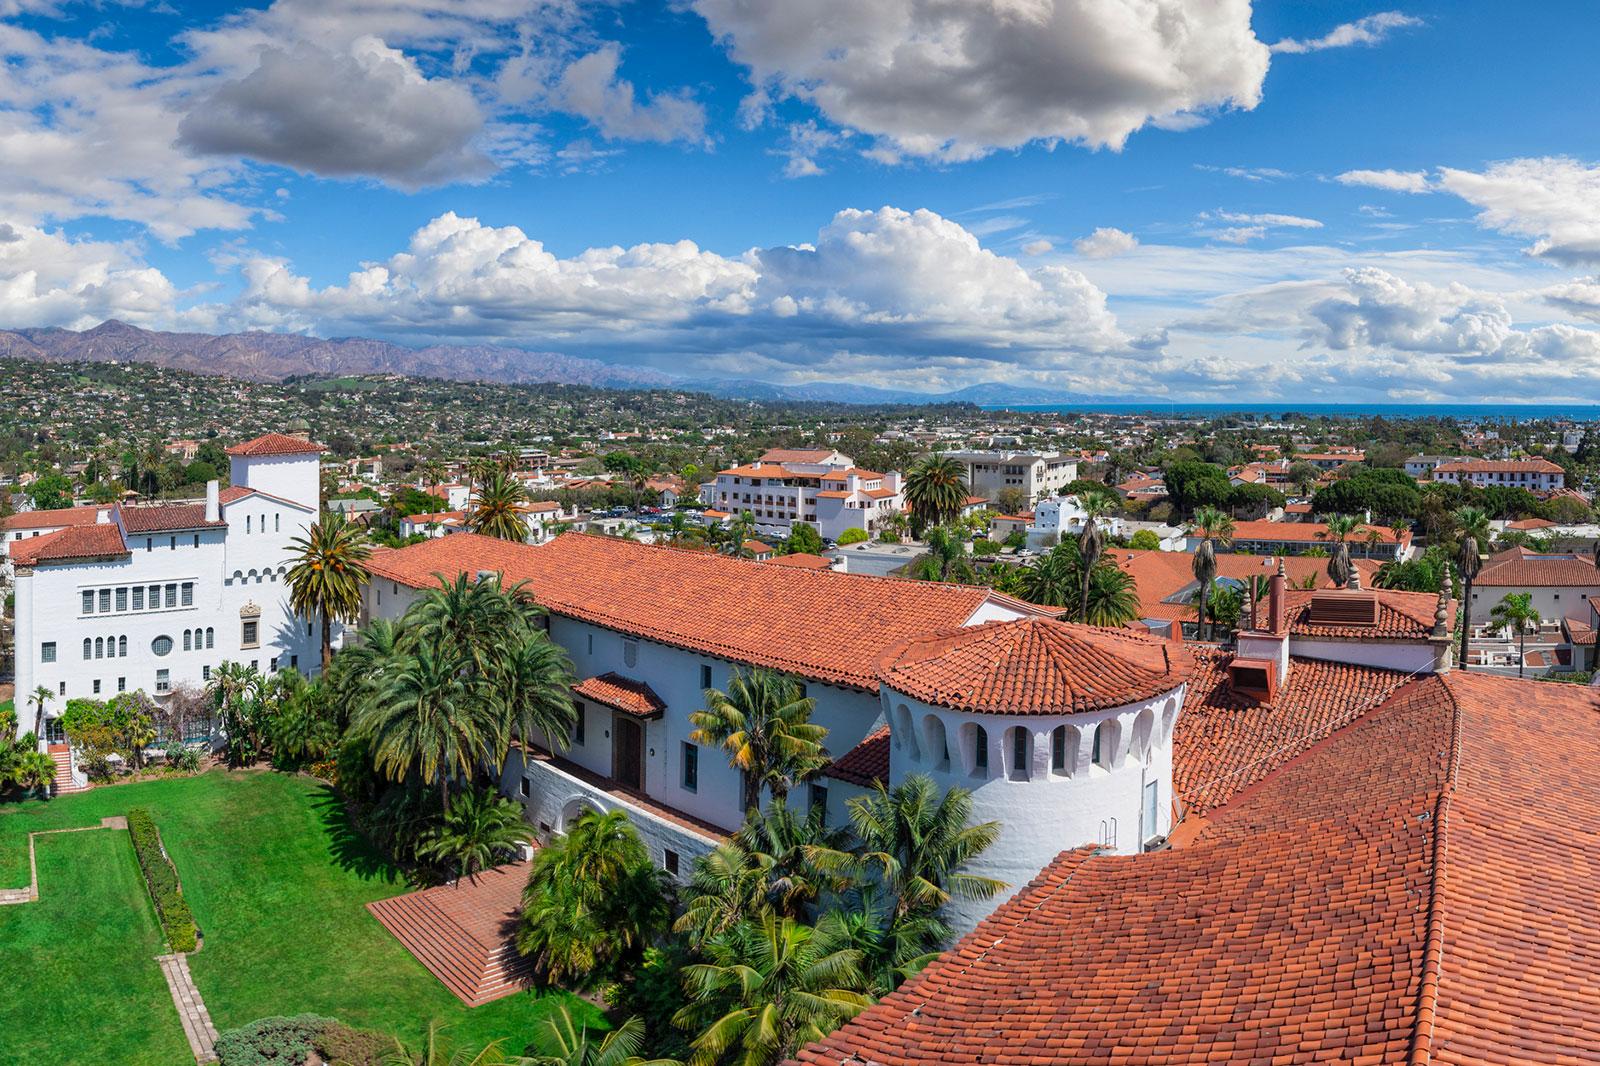 Santa Barbara College Campus